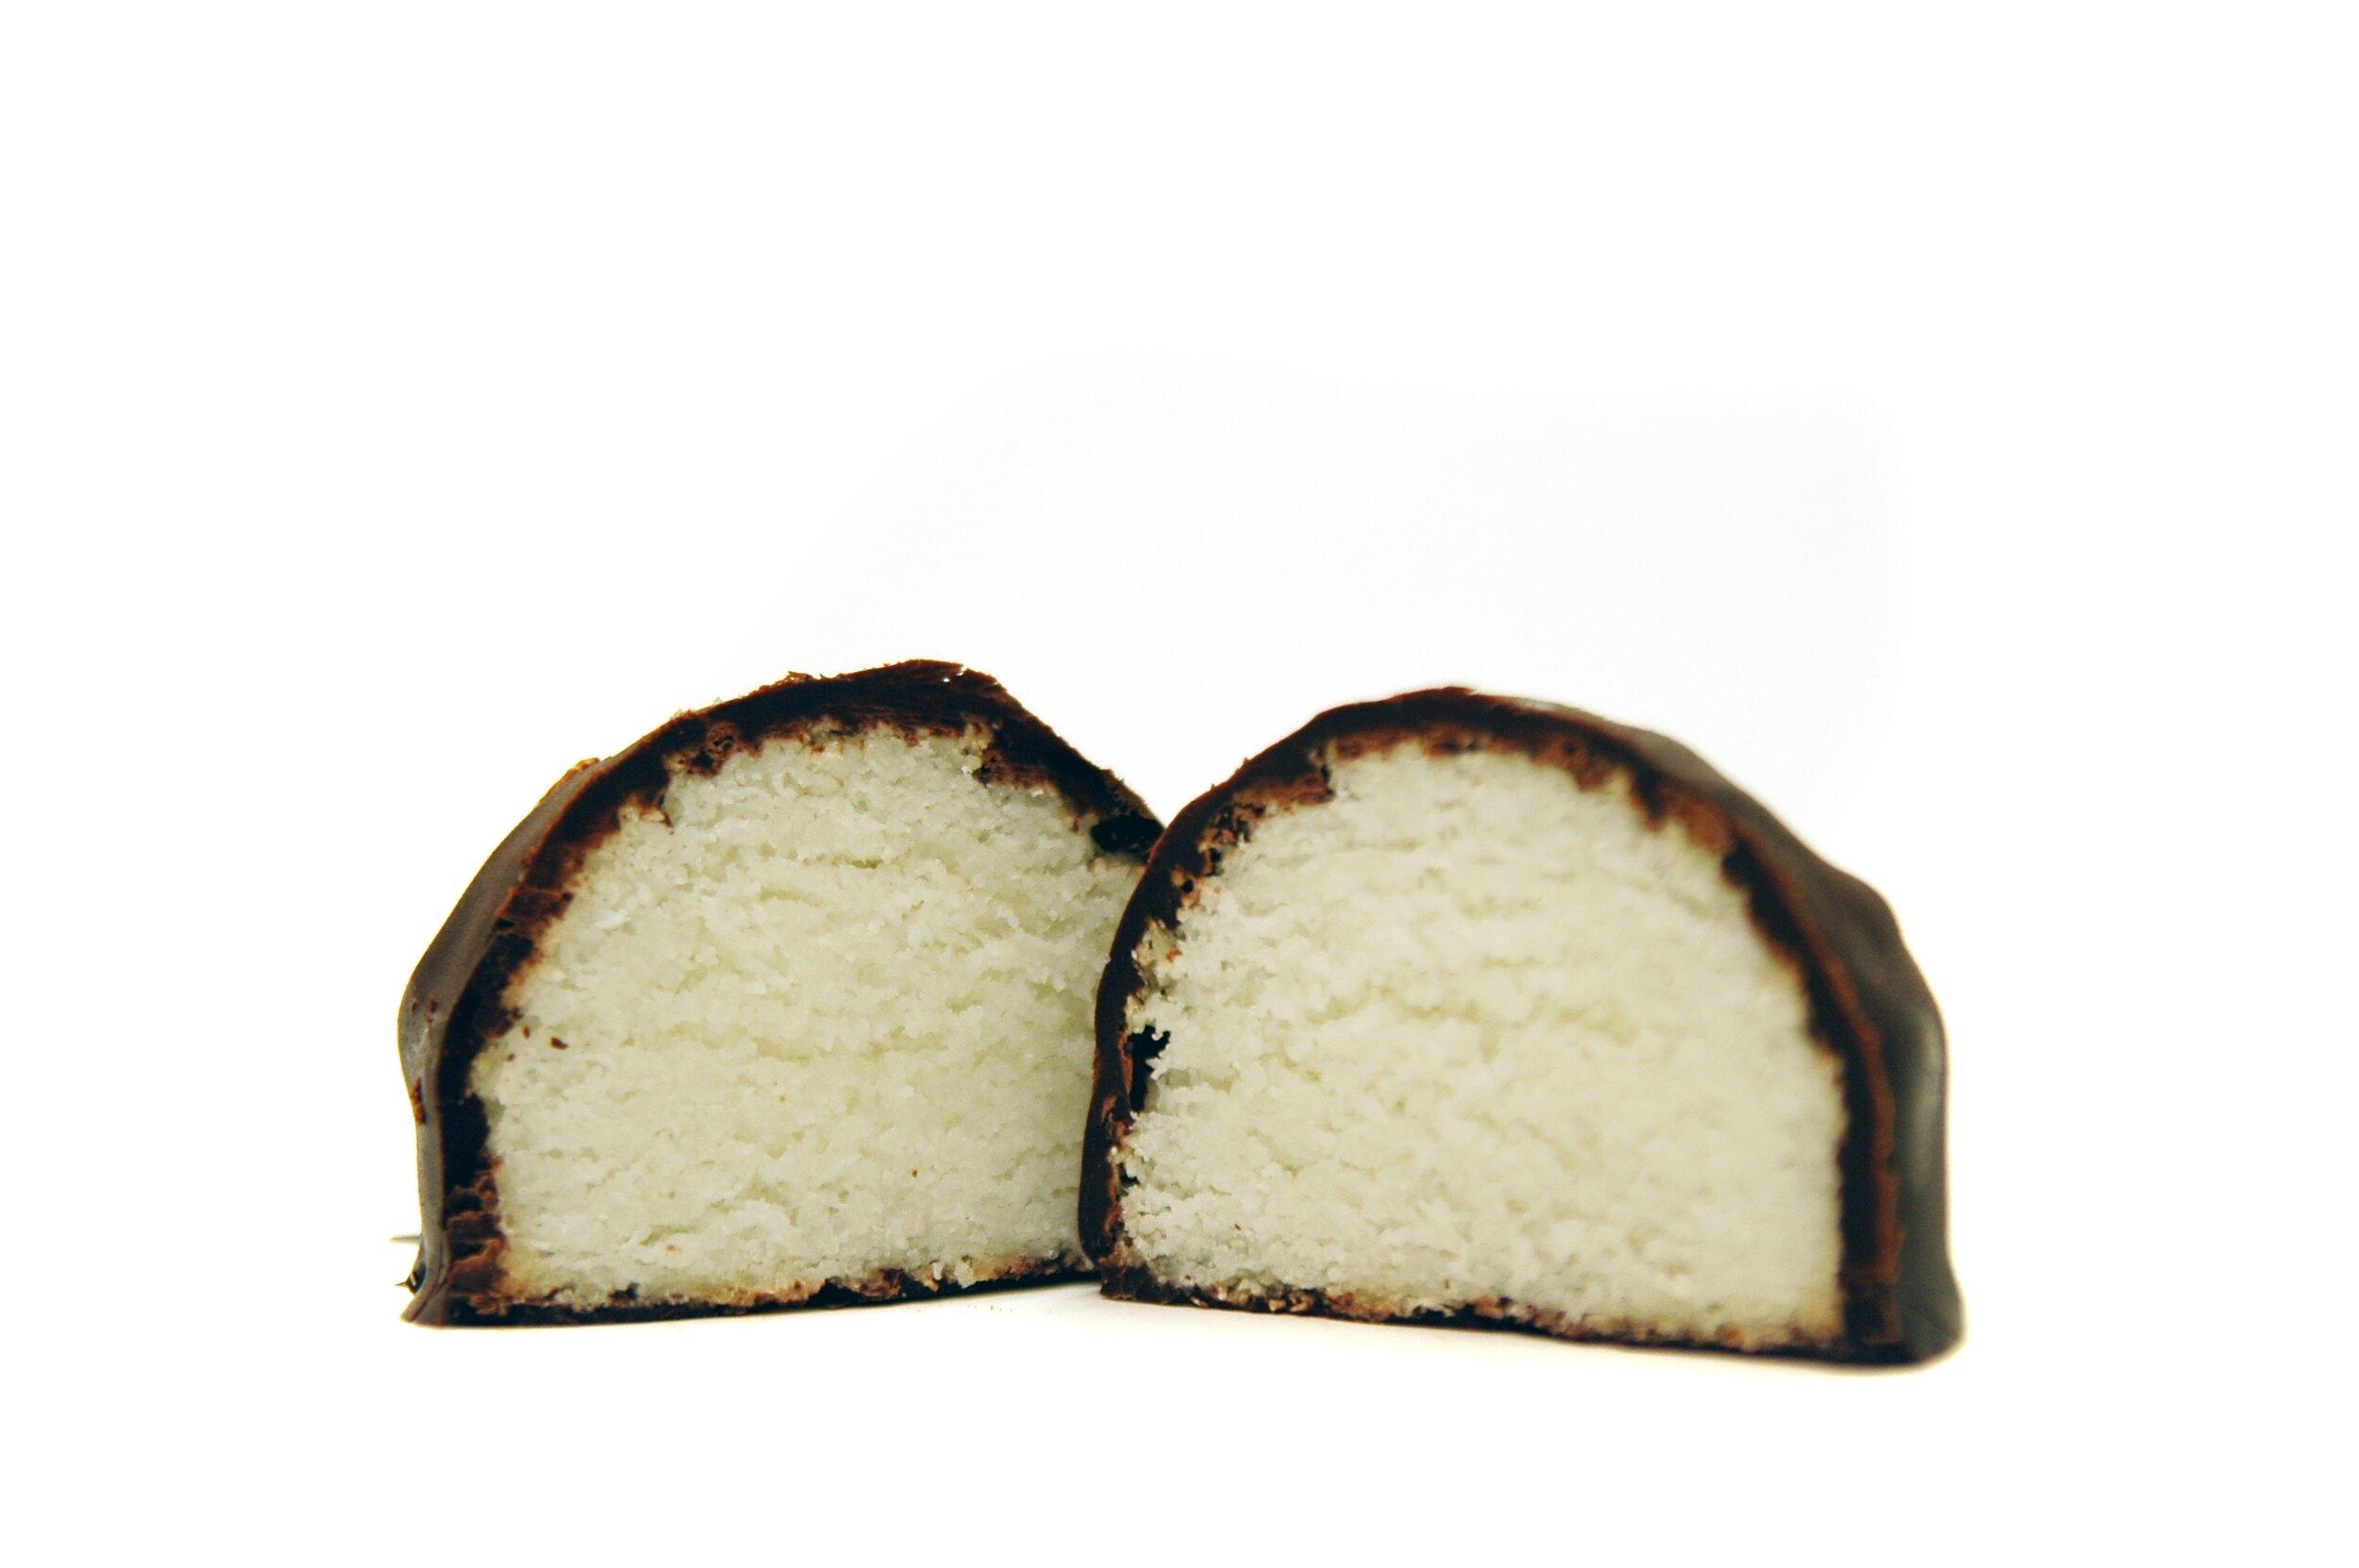 6 X 3 5 Oz Coconut Macaroons Covered In Dark Vegan Chocolate In Gift Box Vintageplantations